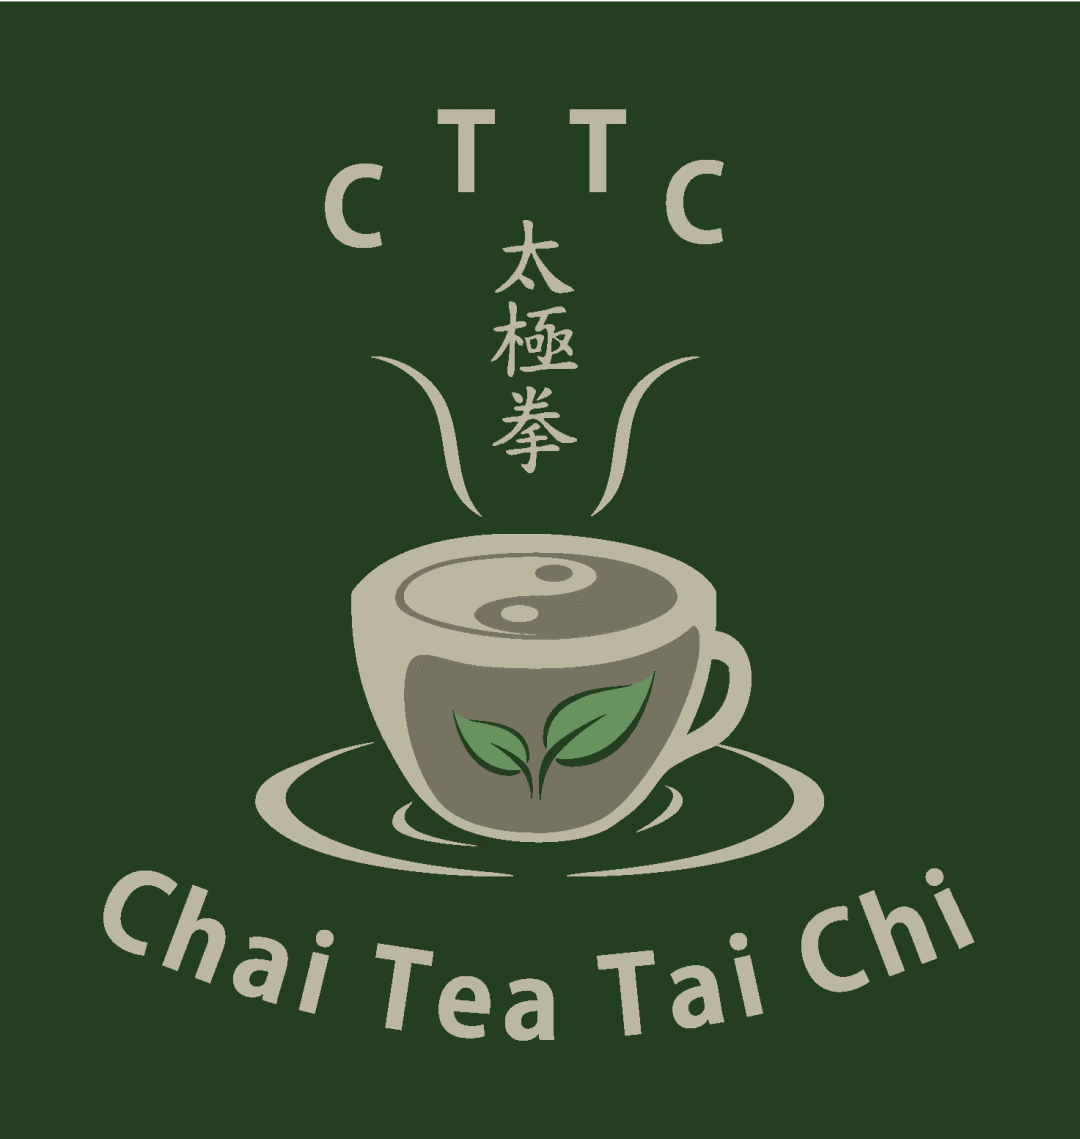 Chai Tea Tai Chi